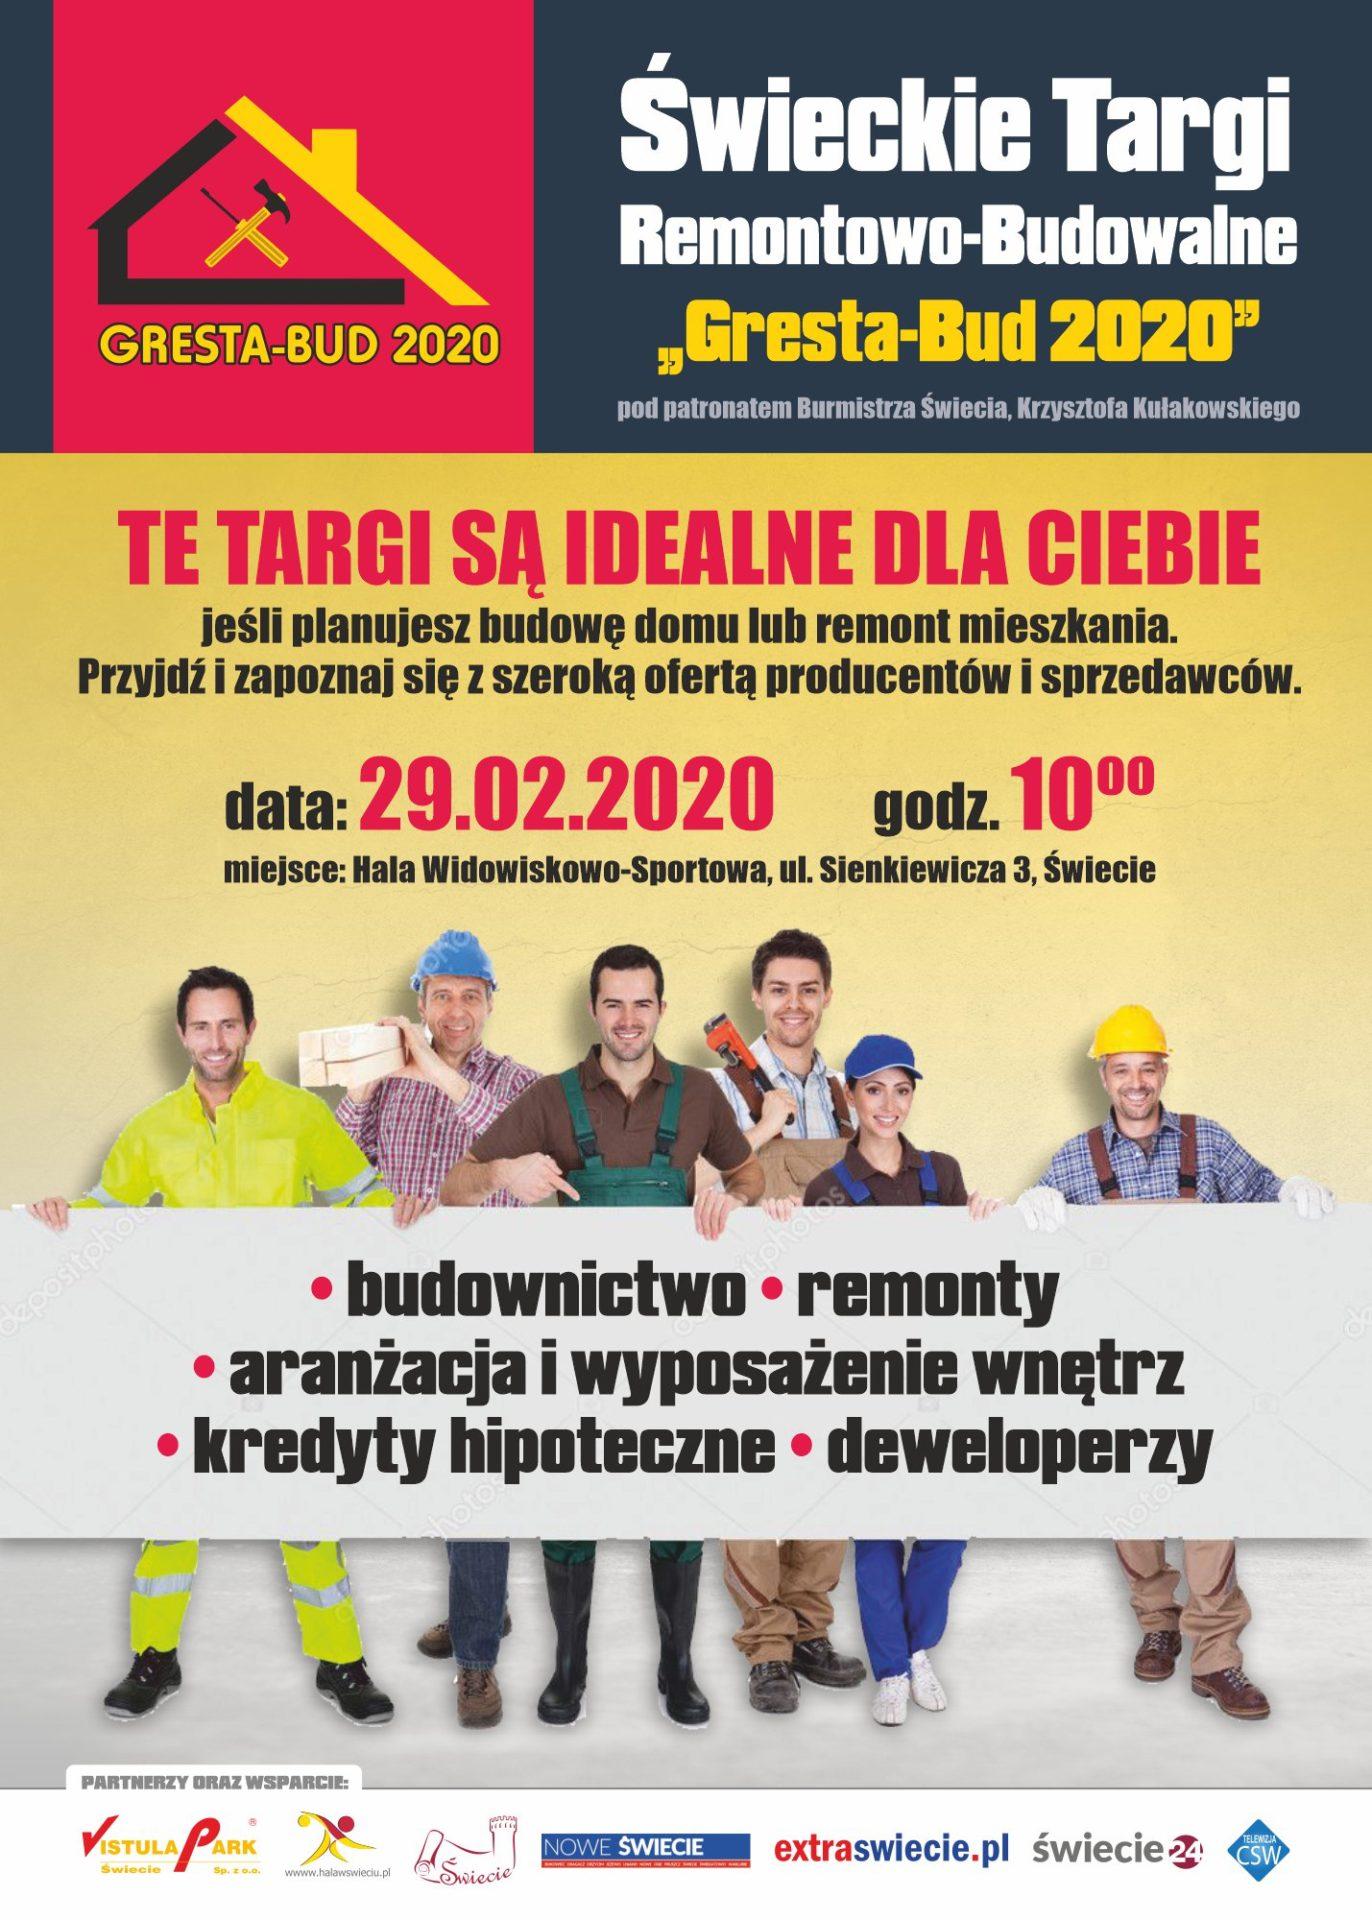 Gresta-Bud 2020